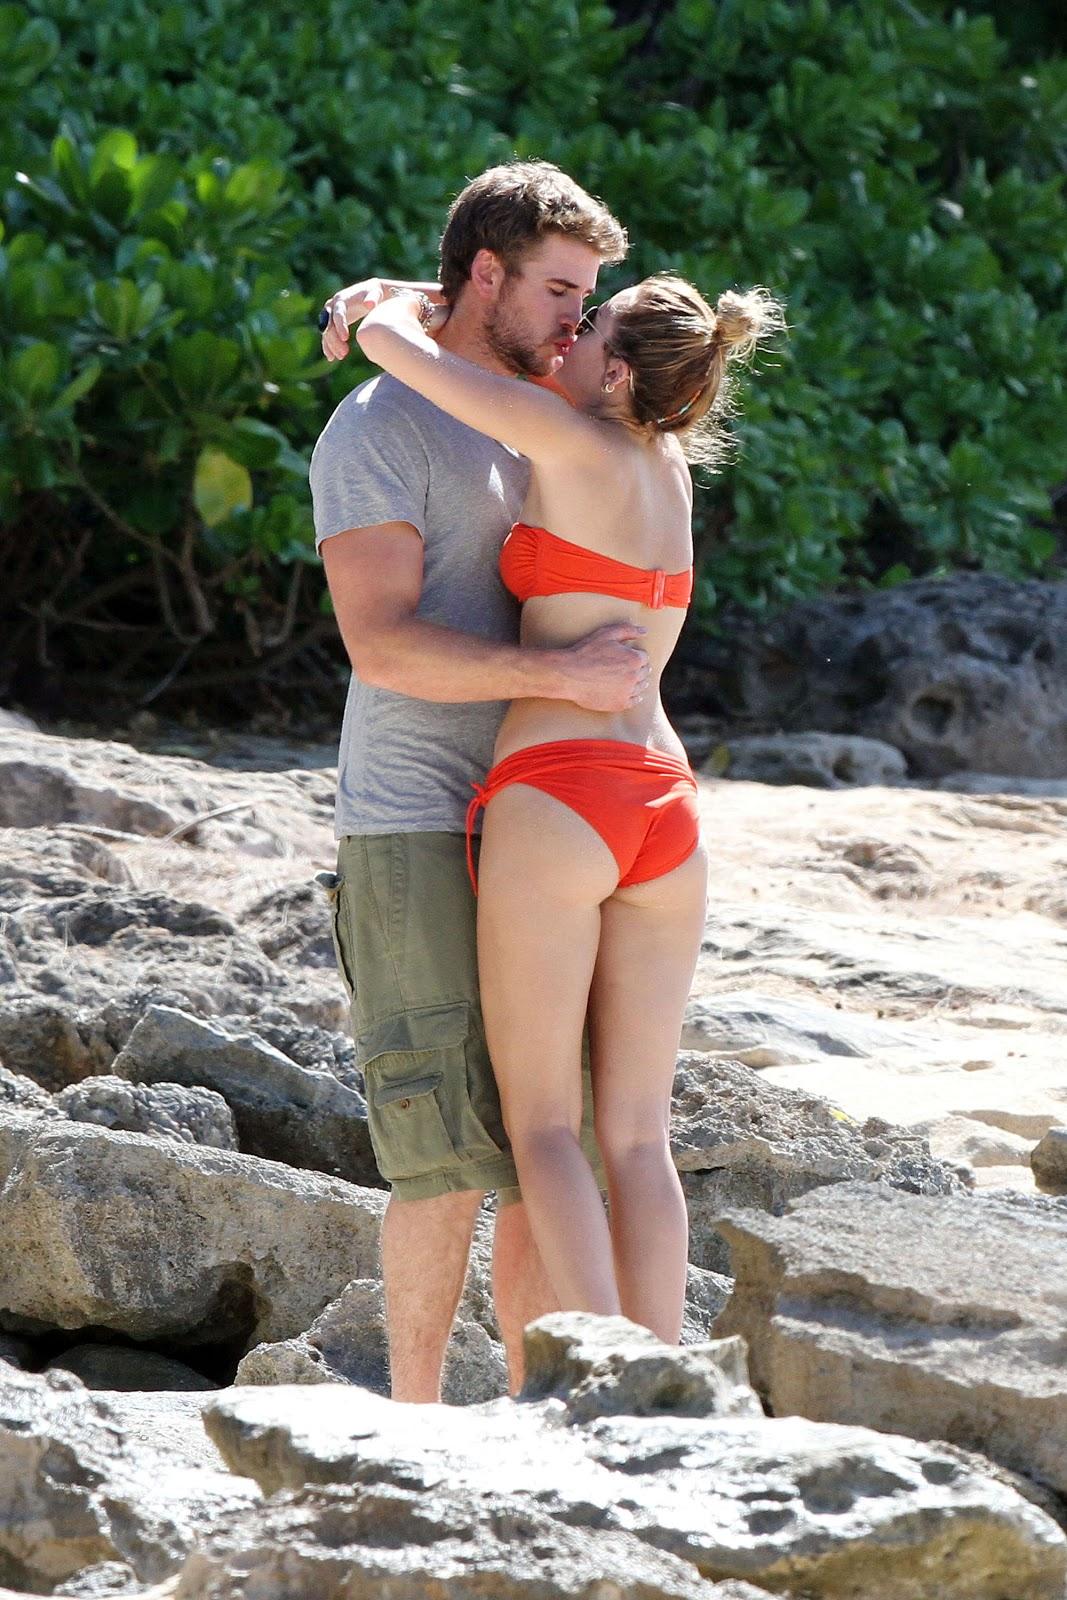 Celanimboa - high quality babes: Miley Cyrus in a bikini on Hawaii ...